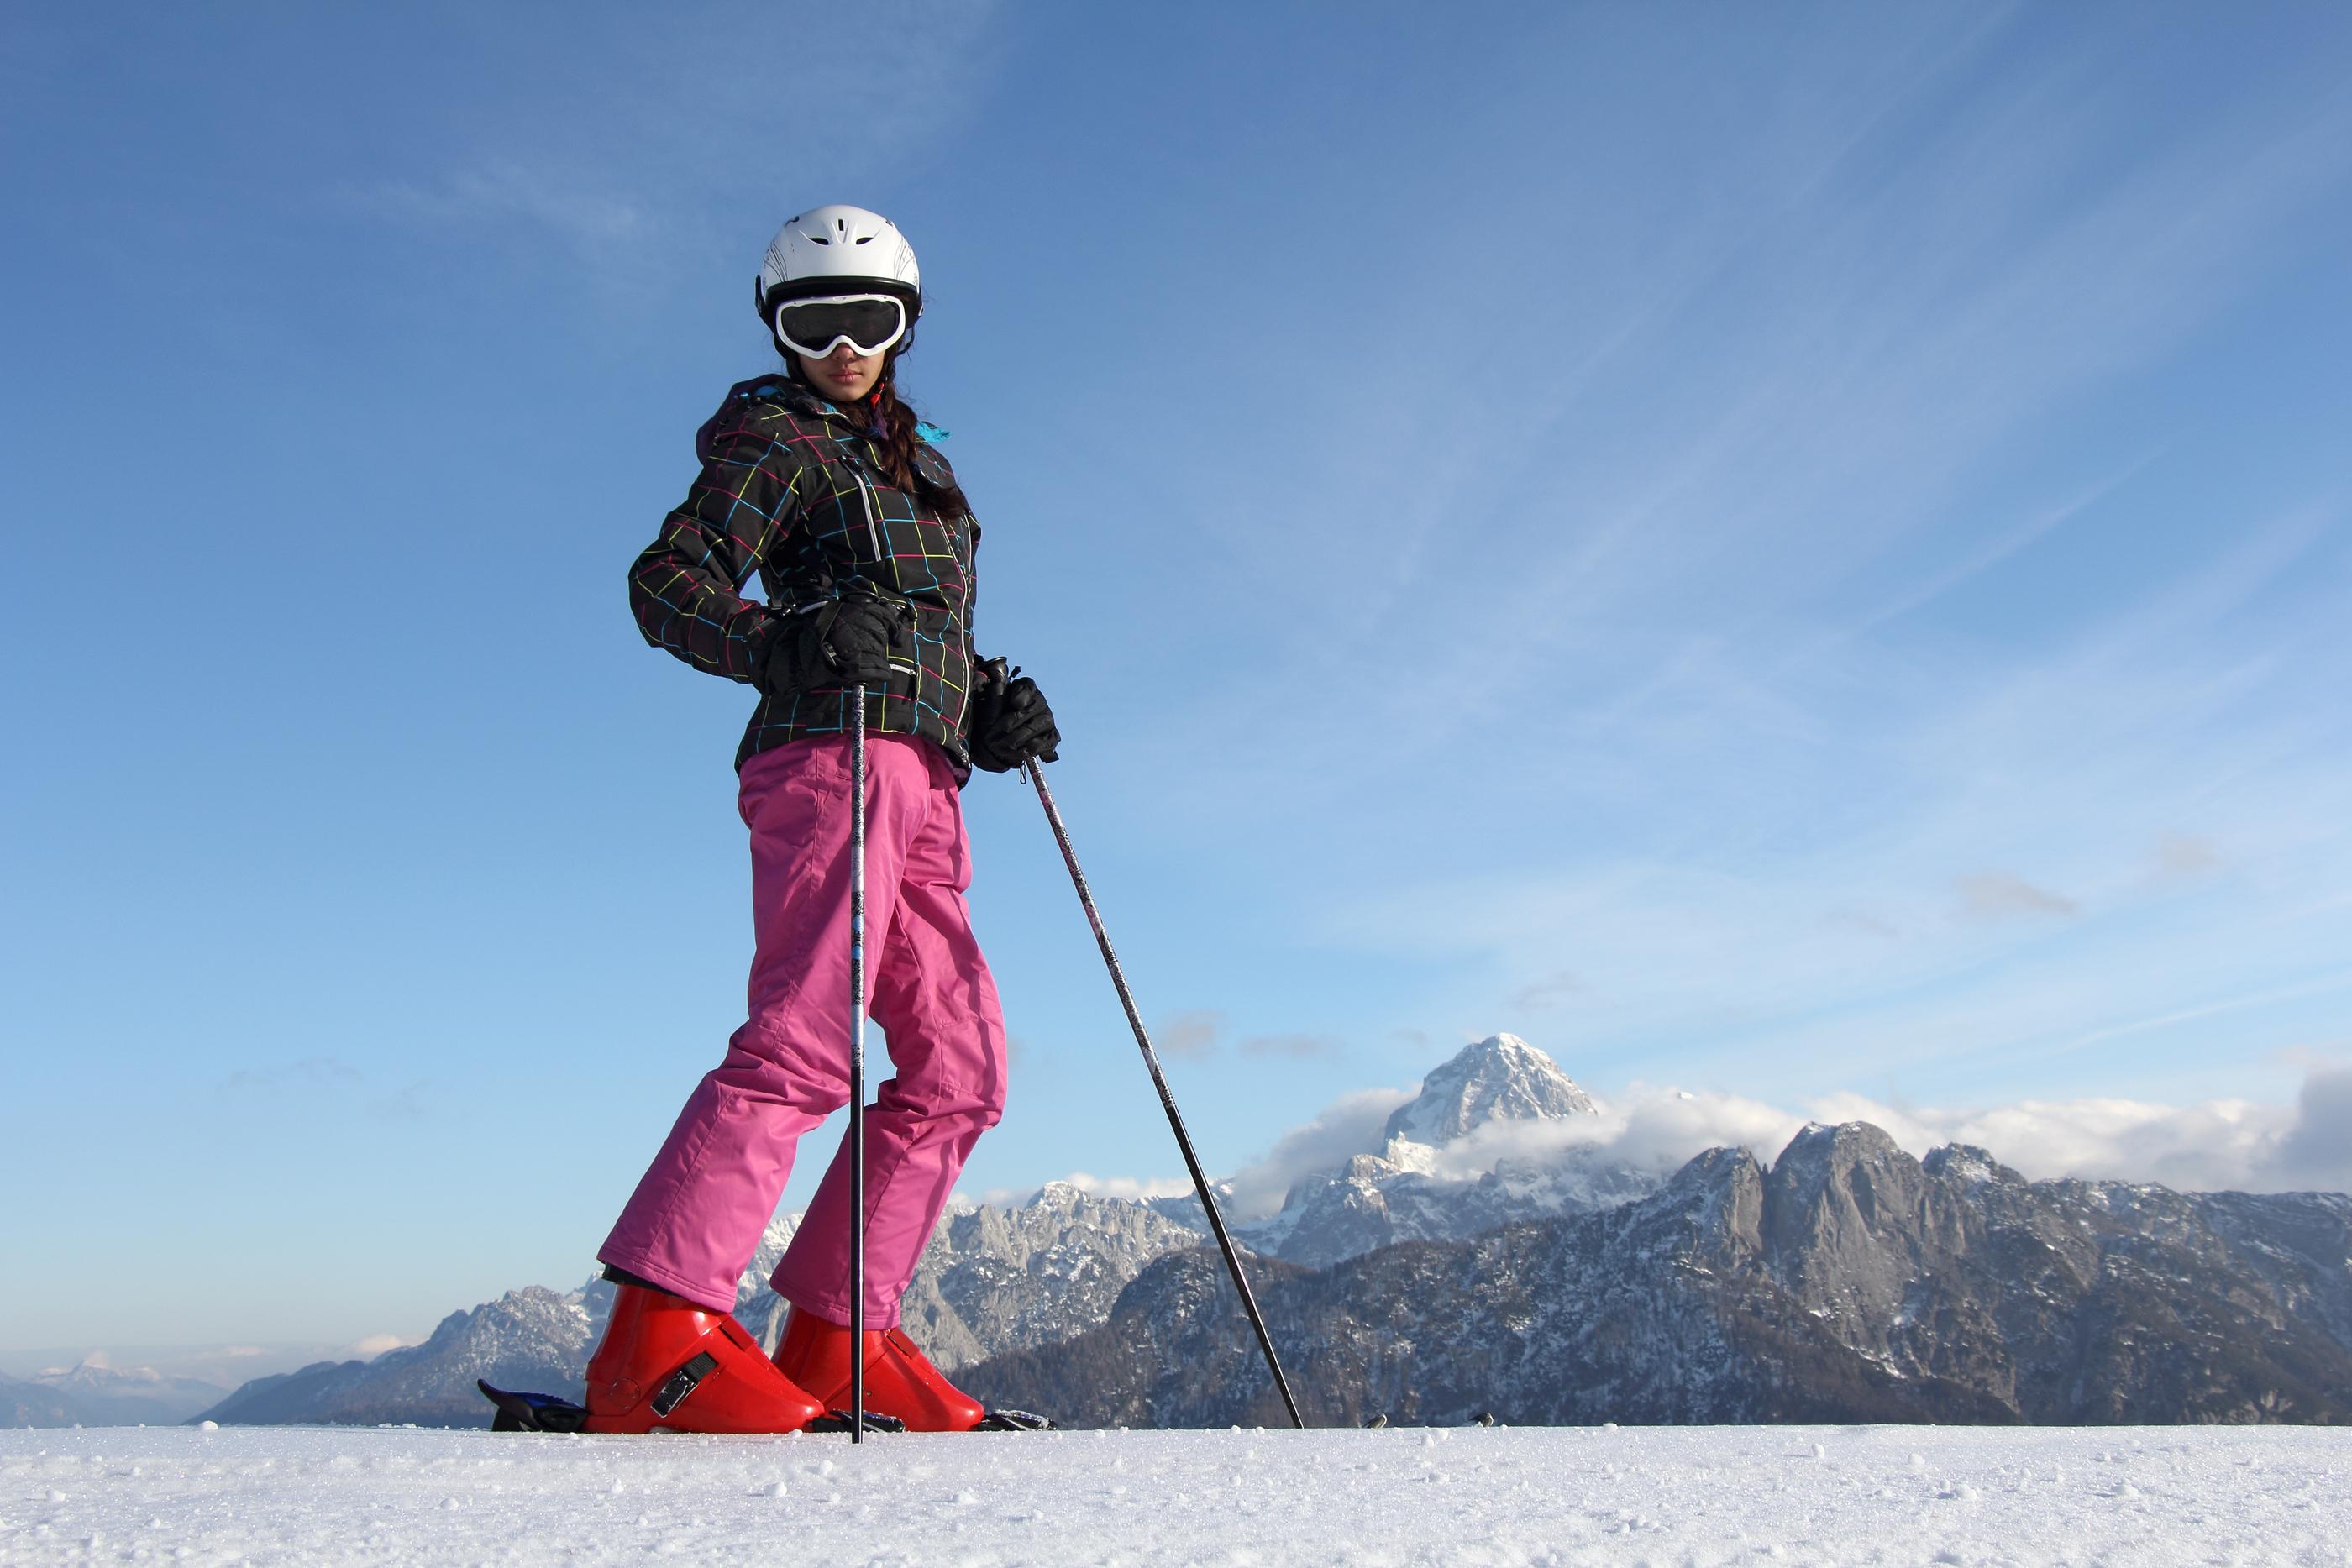 Slopes Chic: Sudsies Tips for Ski Wear Care